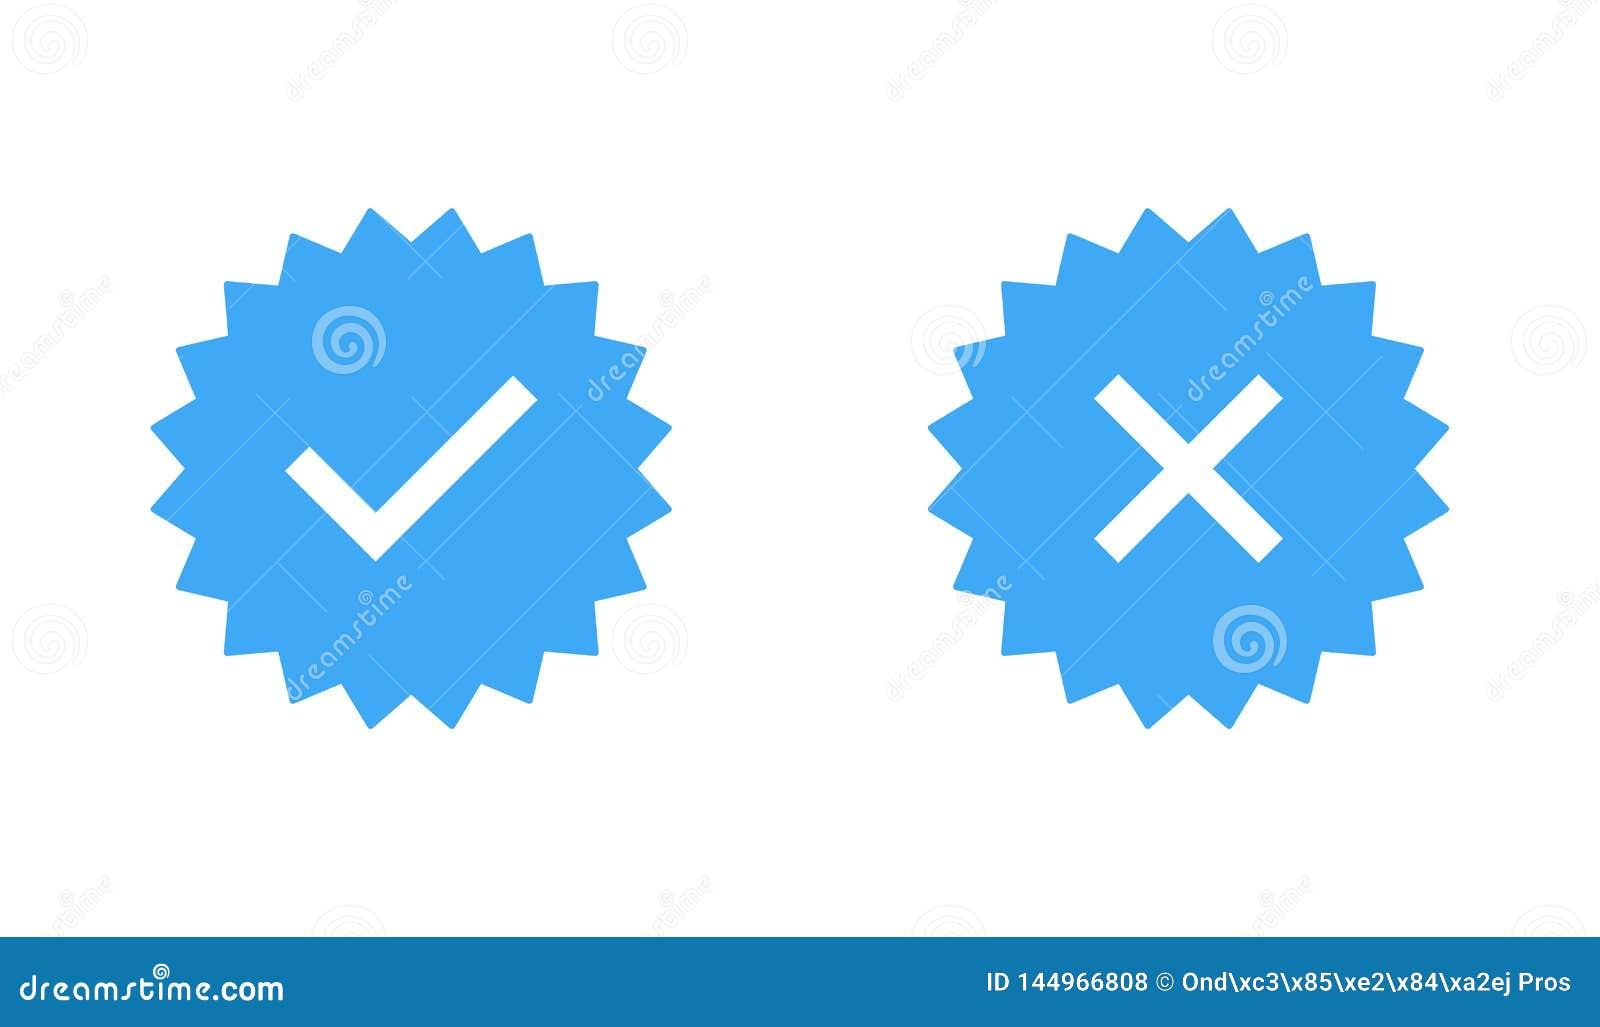 Guaranteed stamp set or verified badge. Verified icon stamp